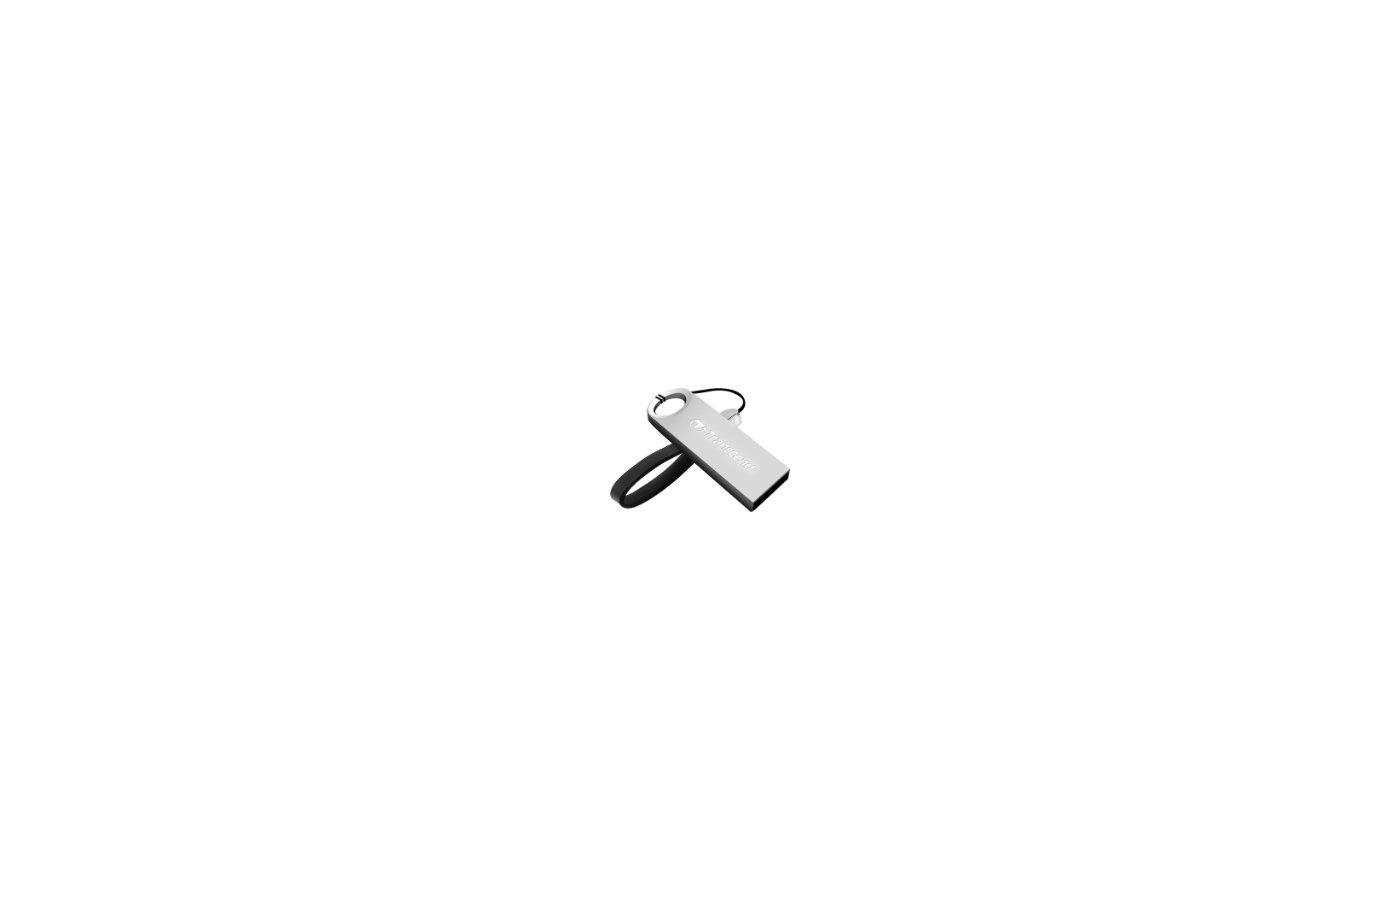 Флеш-диск Transcend 64Gb JetFlash 520S TS64GJF520S USB2.0 серебристый